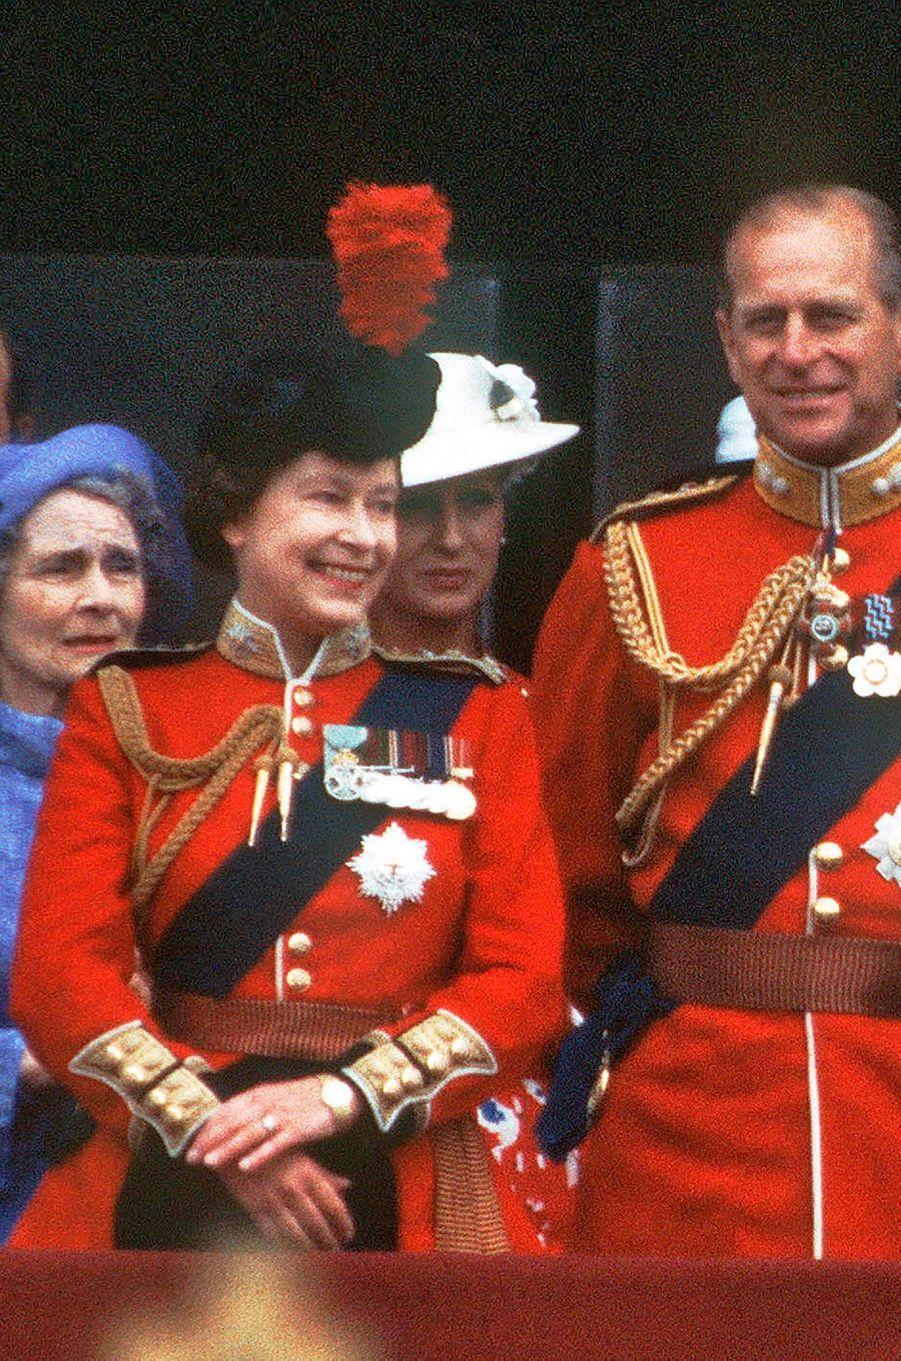 La reine Elizabeth II d'Angleterre, le 12 juin 1982